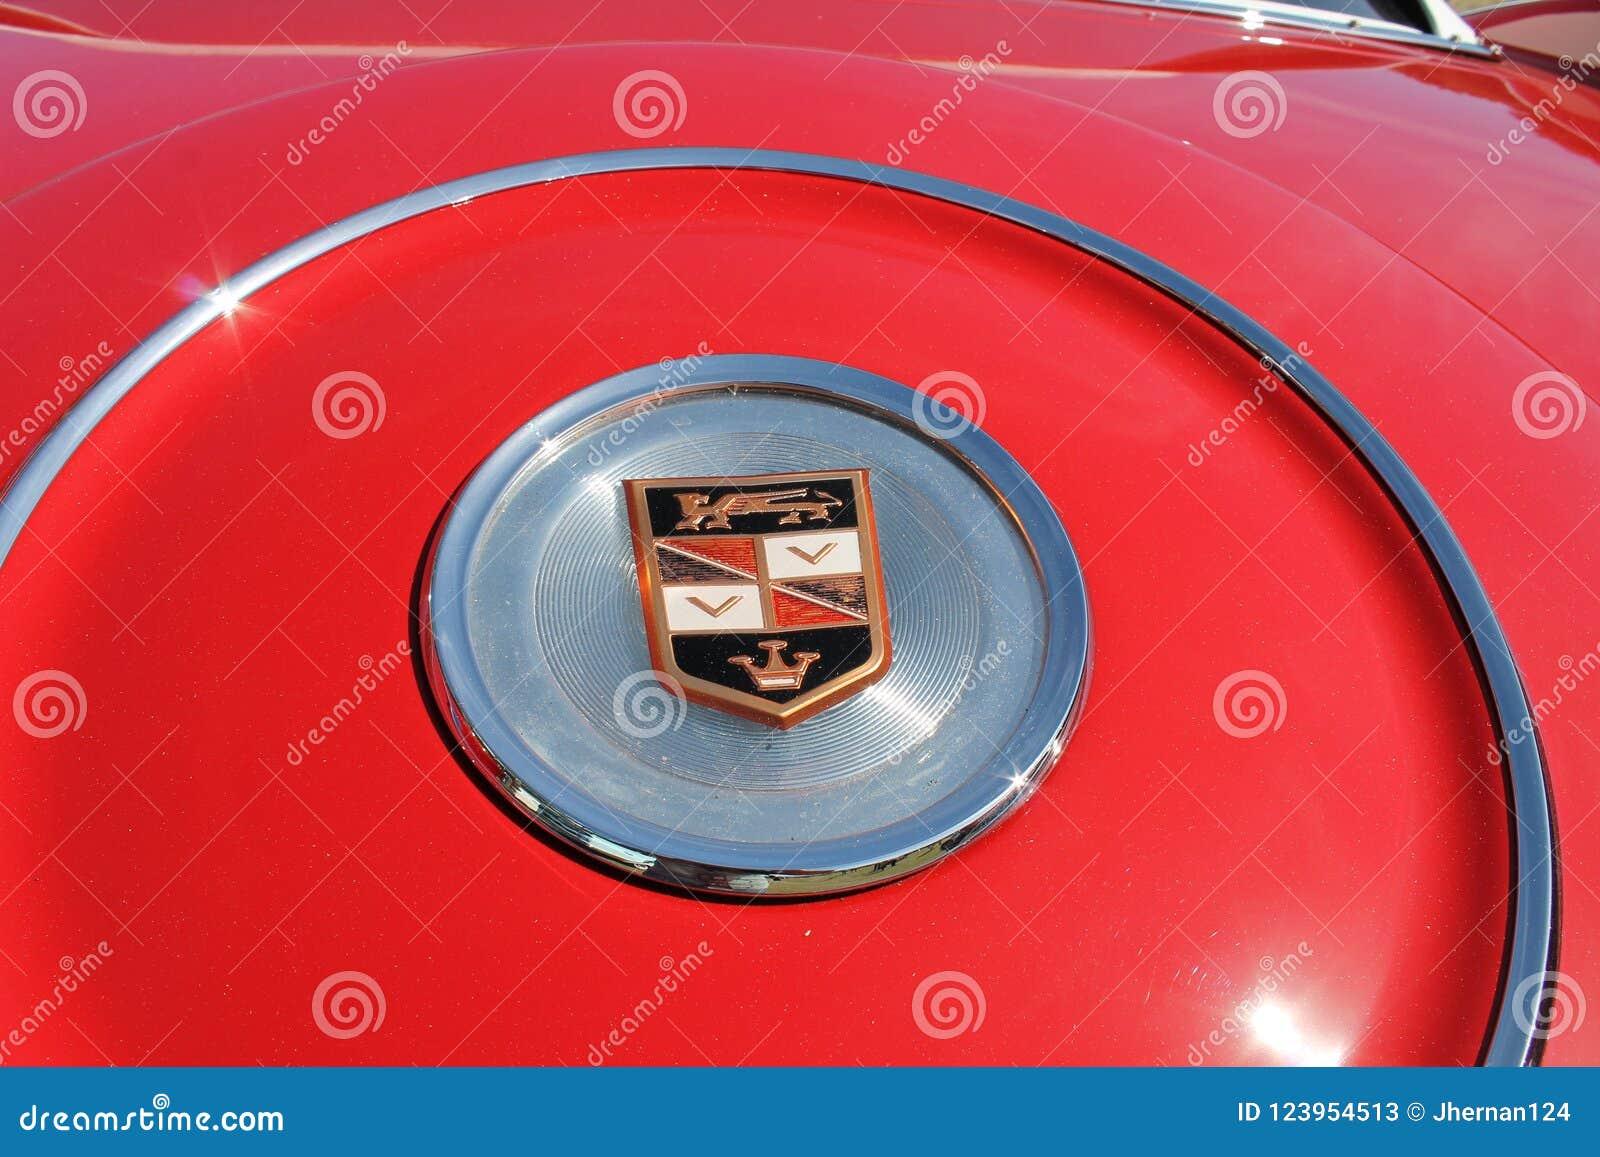 Classic luxury americana car detail